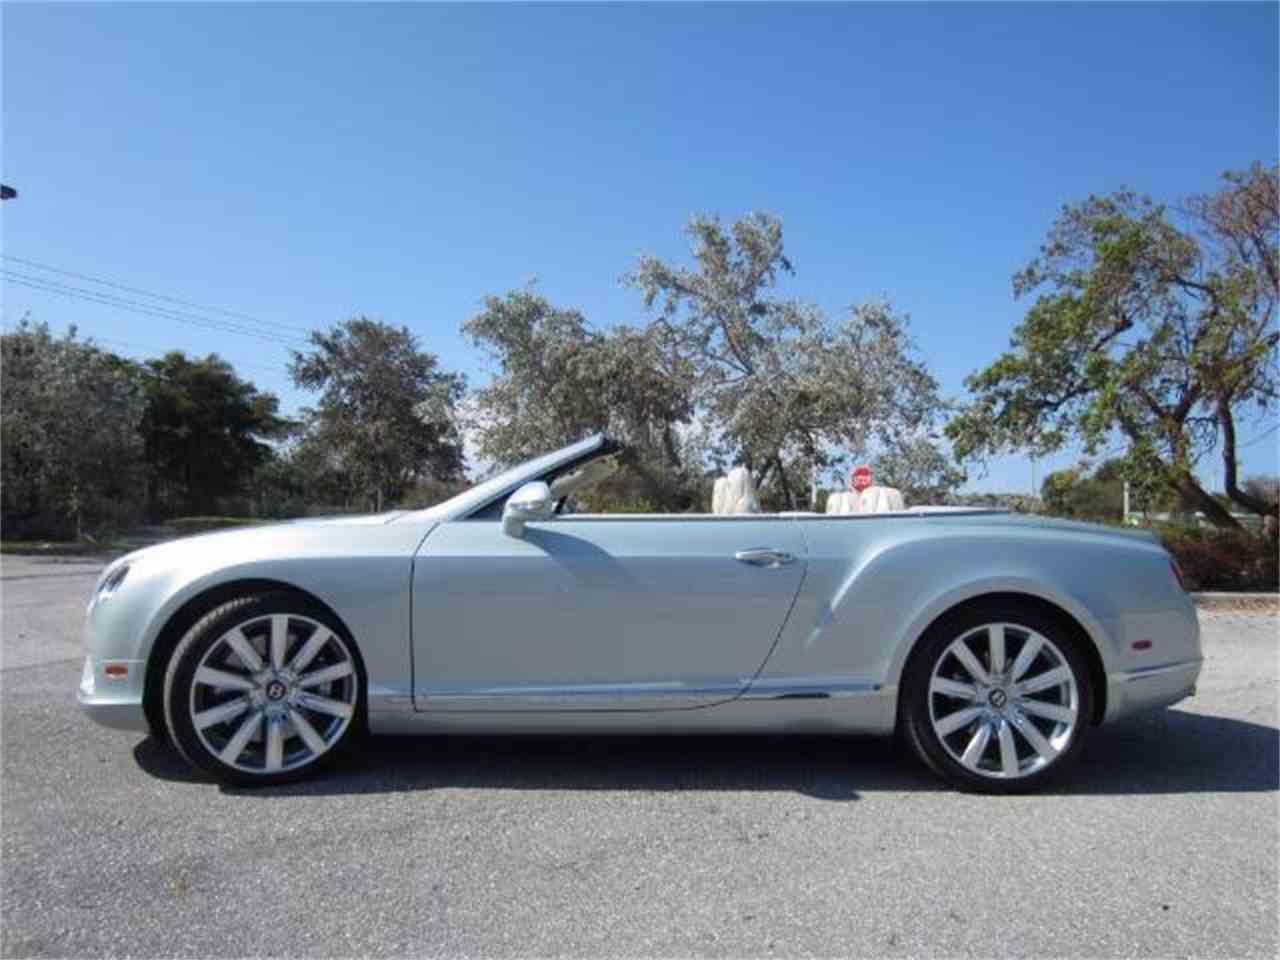 2013 Bentley Continental GTC V8 for Sale | ClassicCars.com | CC-1022458